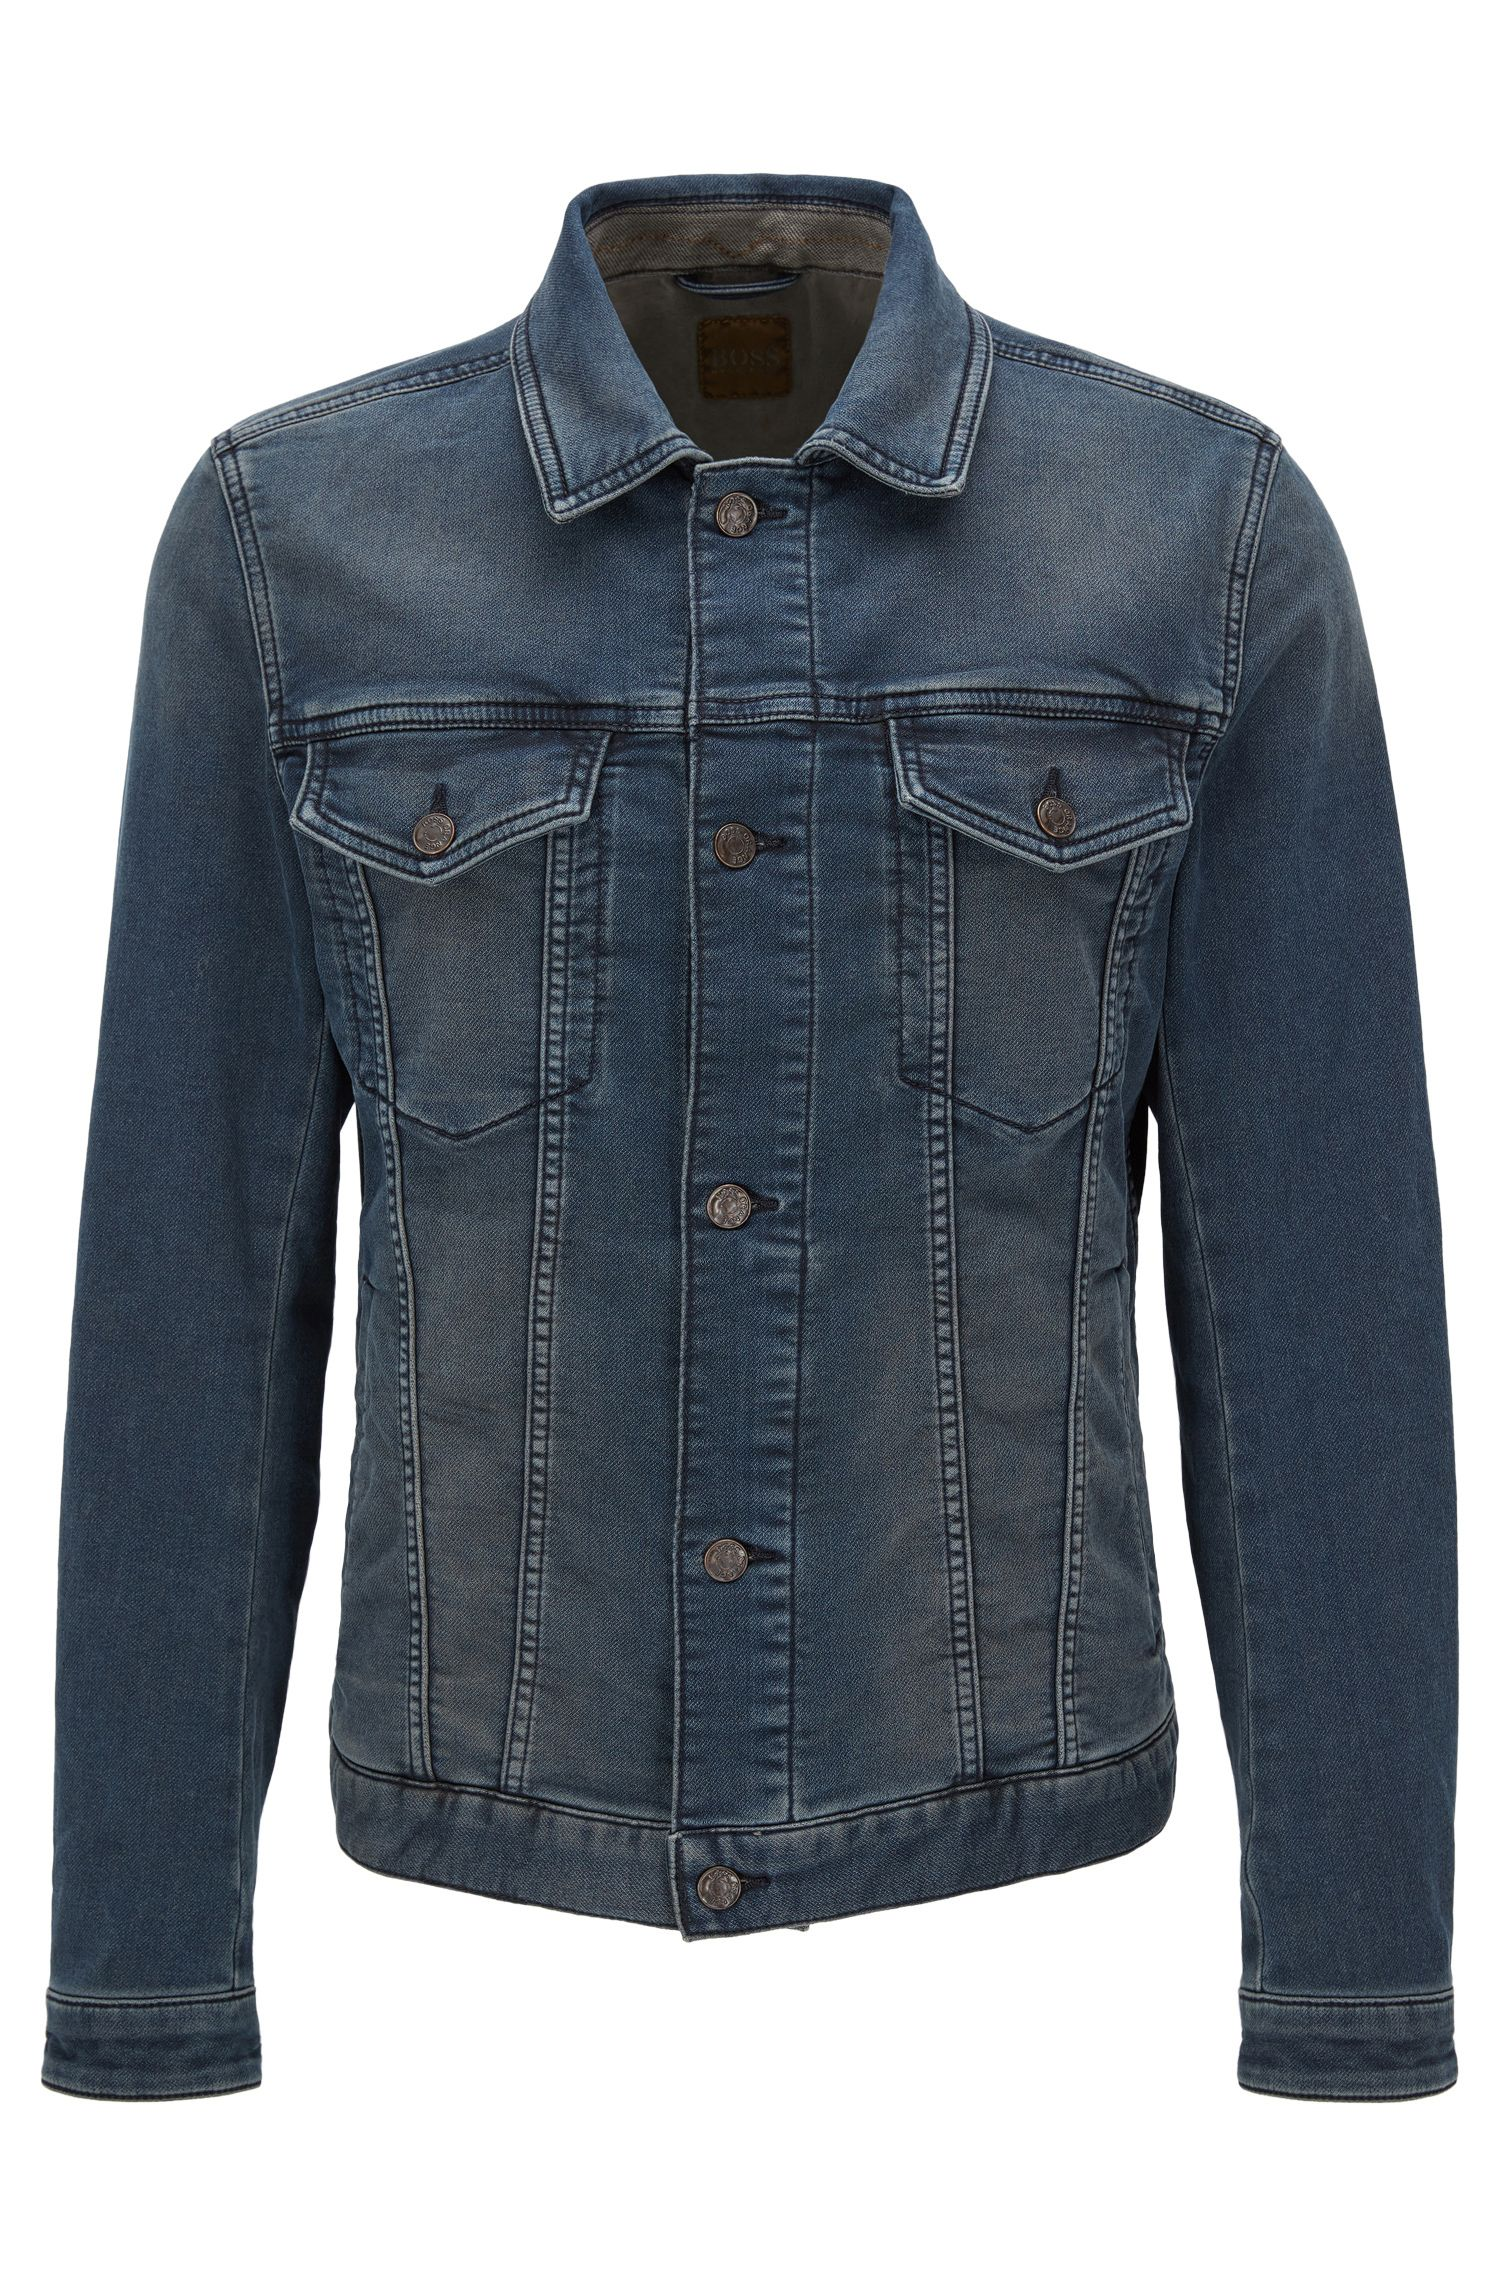 10.5 oz Stretch Cotton Denim Jacket, Slim Fit | Orange Livingston